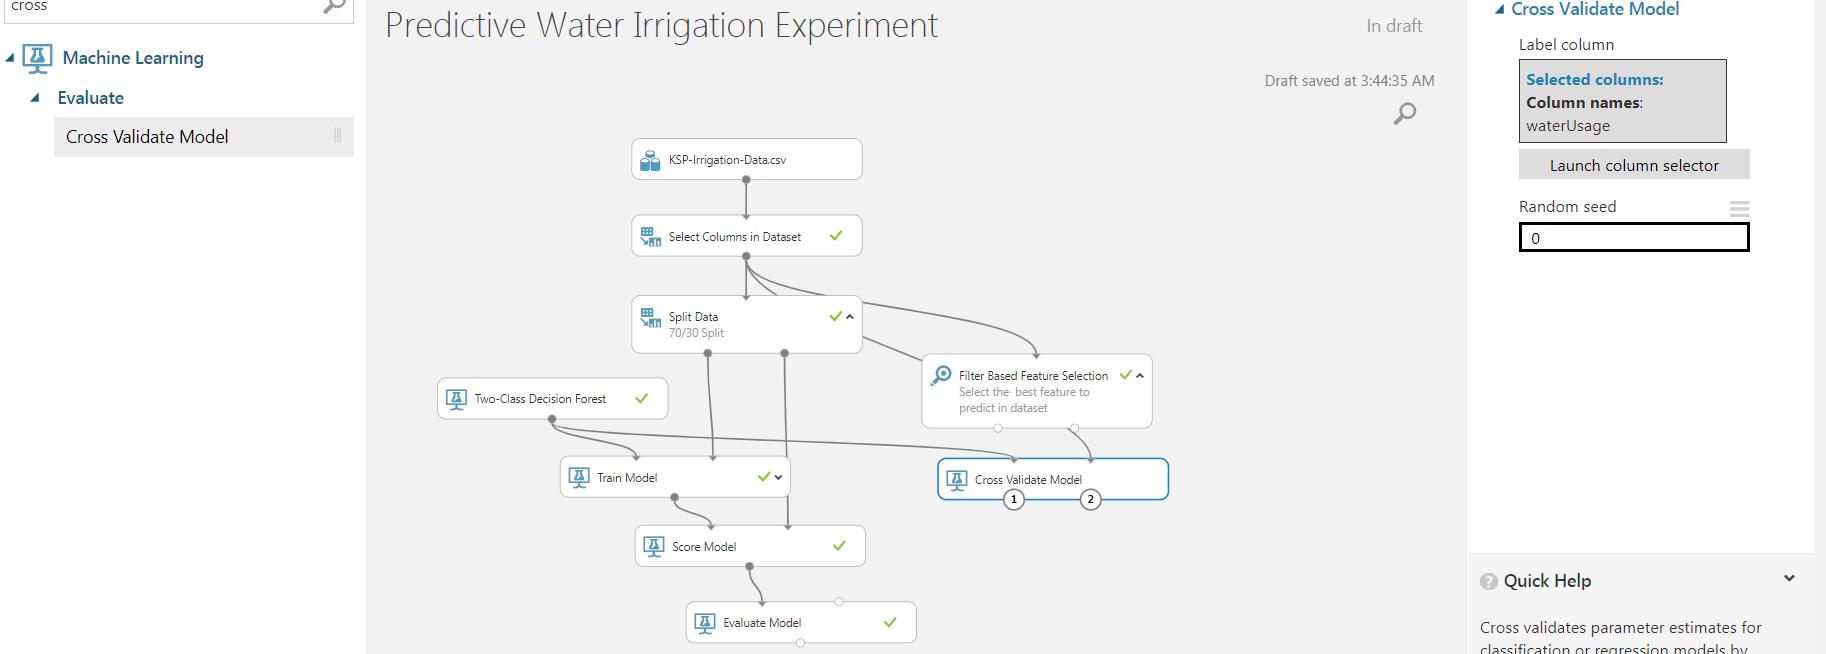 17 - Agriculture Water Irrigation - Predictive Analytics Using Microsoft Azure ML